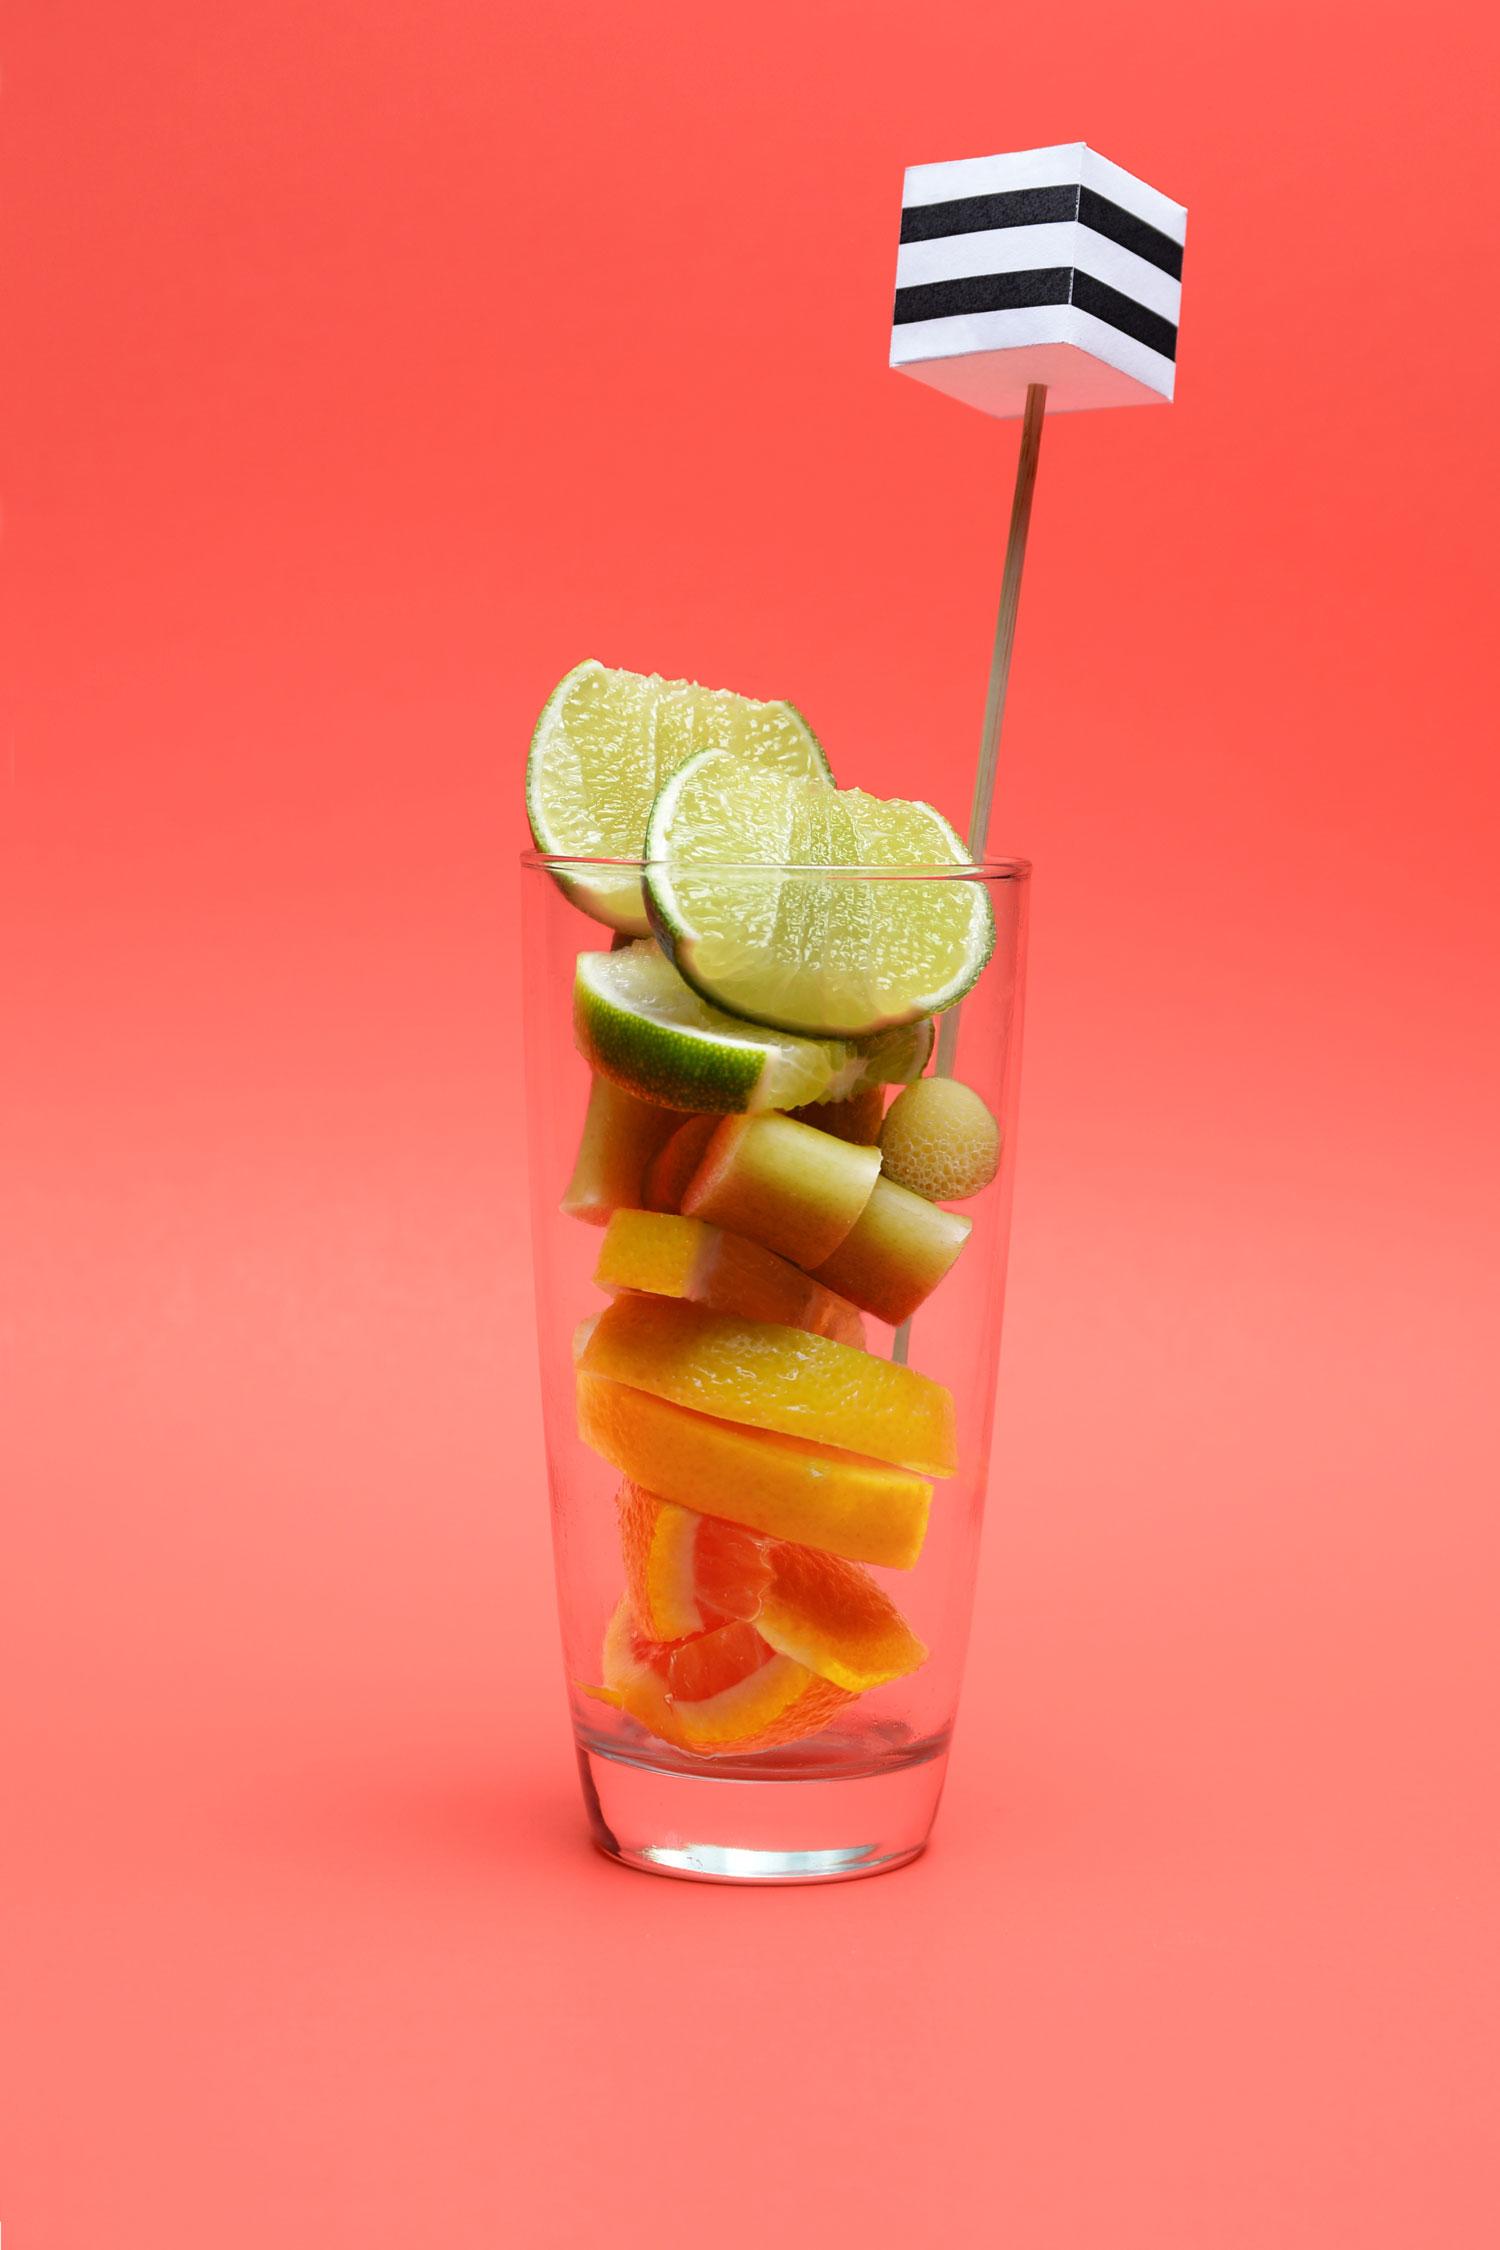 MISS-CLOUDY-jll-photograpahies-summer-cocktail-citrus-agrume.jpg